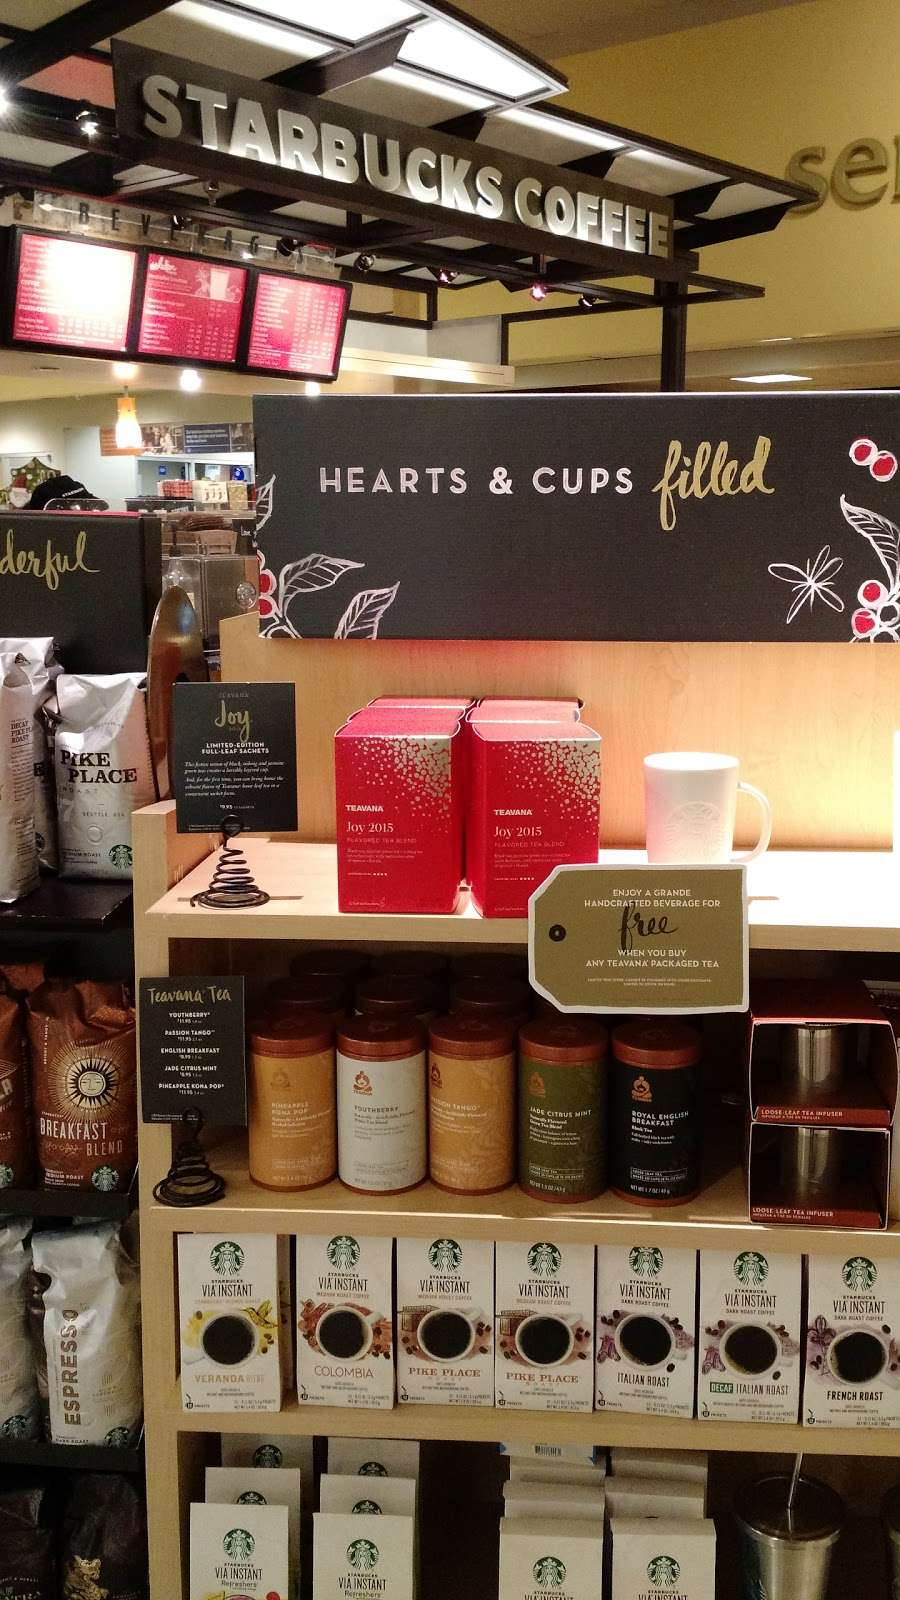 Starbucks - cafe  | Photo 2 of 2 | Address: 9229 Lincoln Ave, Littleton, CO 80124, USA | Phone: (303) 649-9111